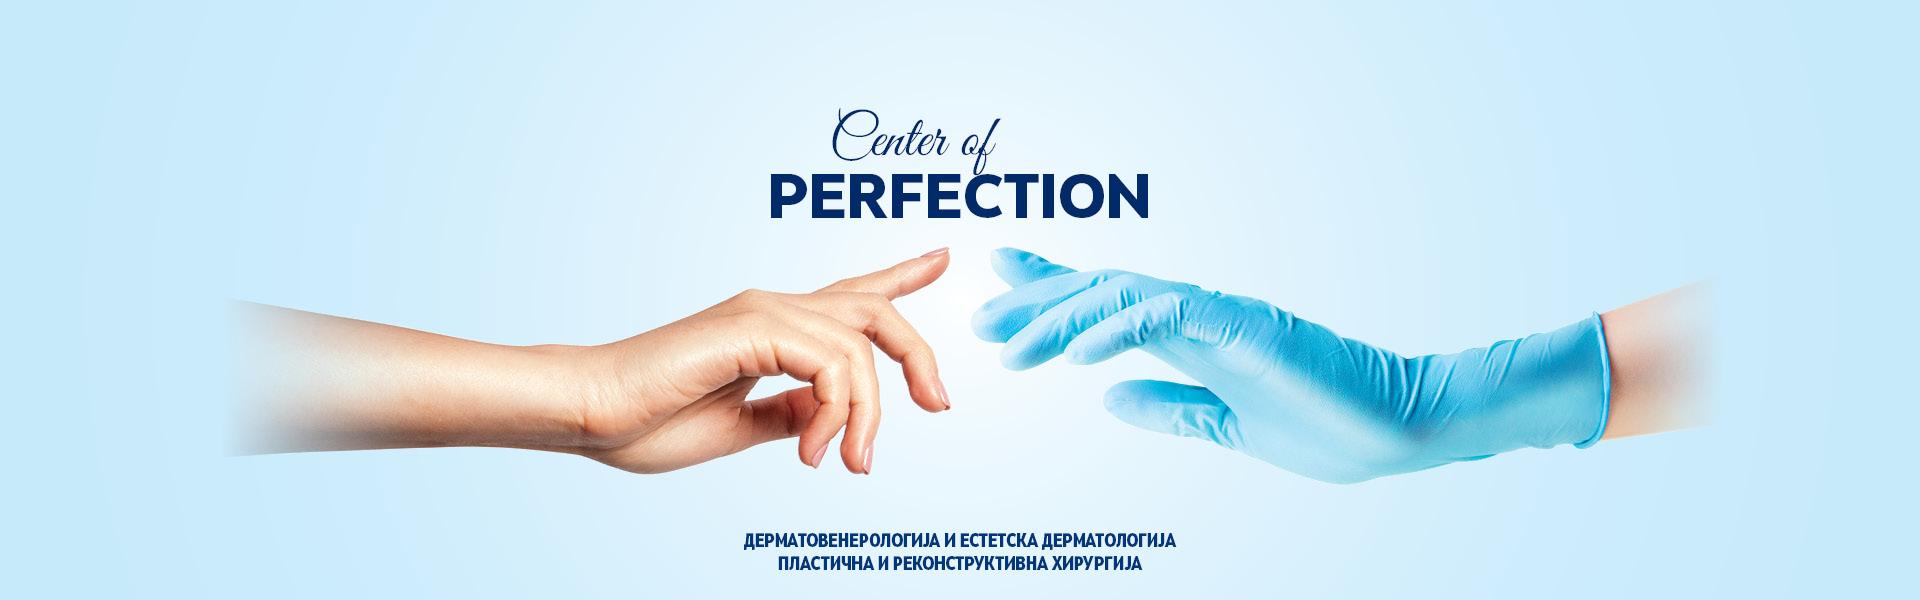 AS Dermatologija WebKorporativen no body paragraph